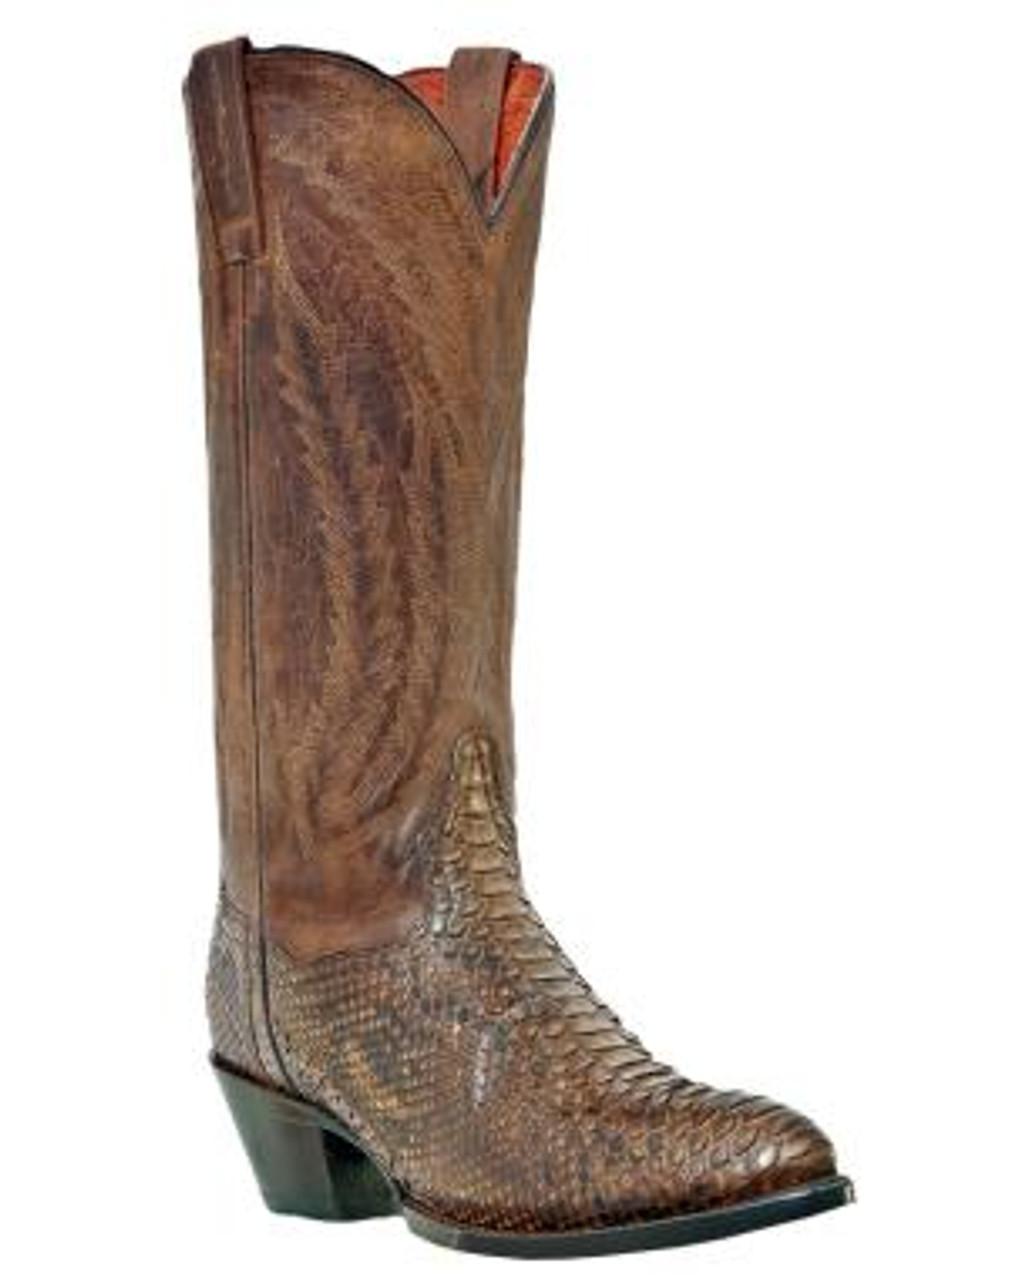 e3491fb4a1a Men's Dan Post Brown Python Snakeskin Cowboy Boot